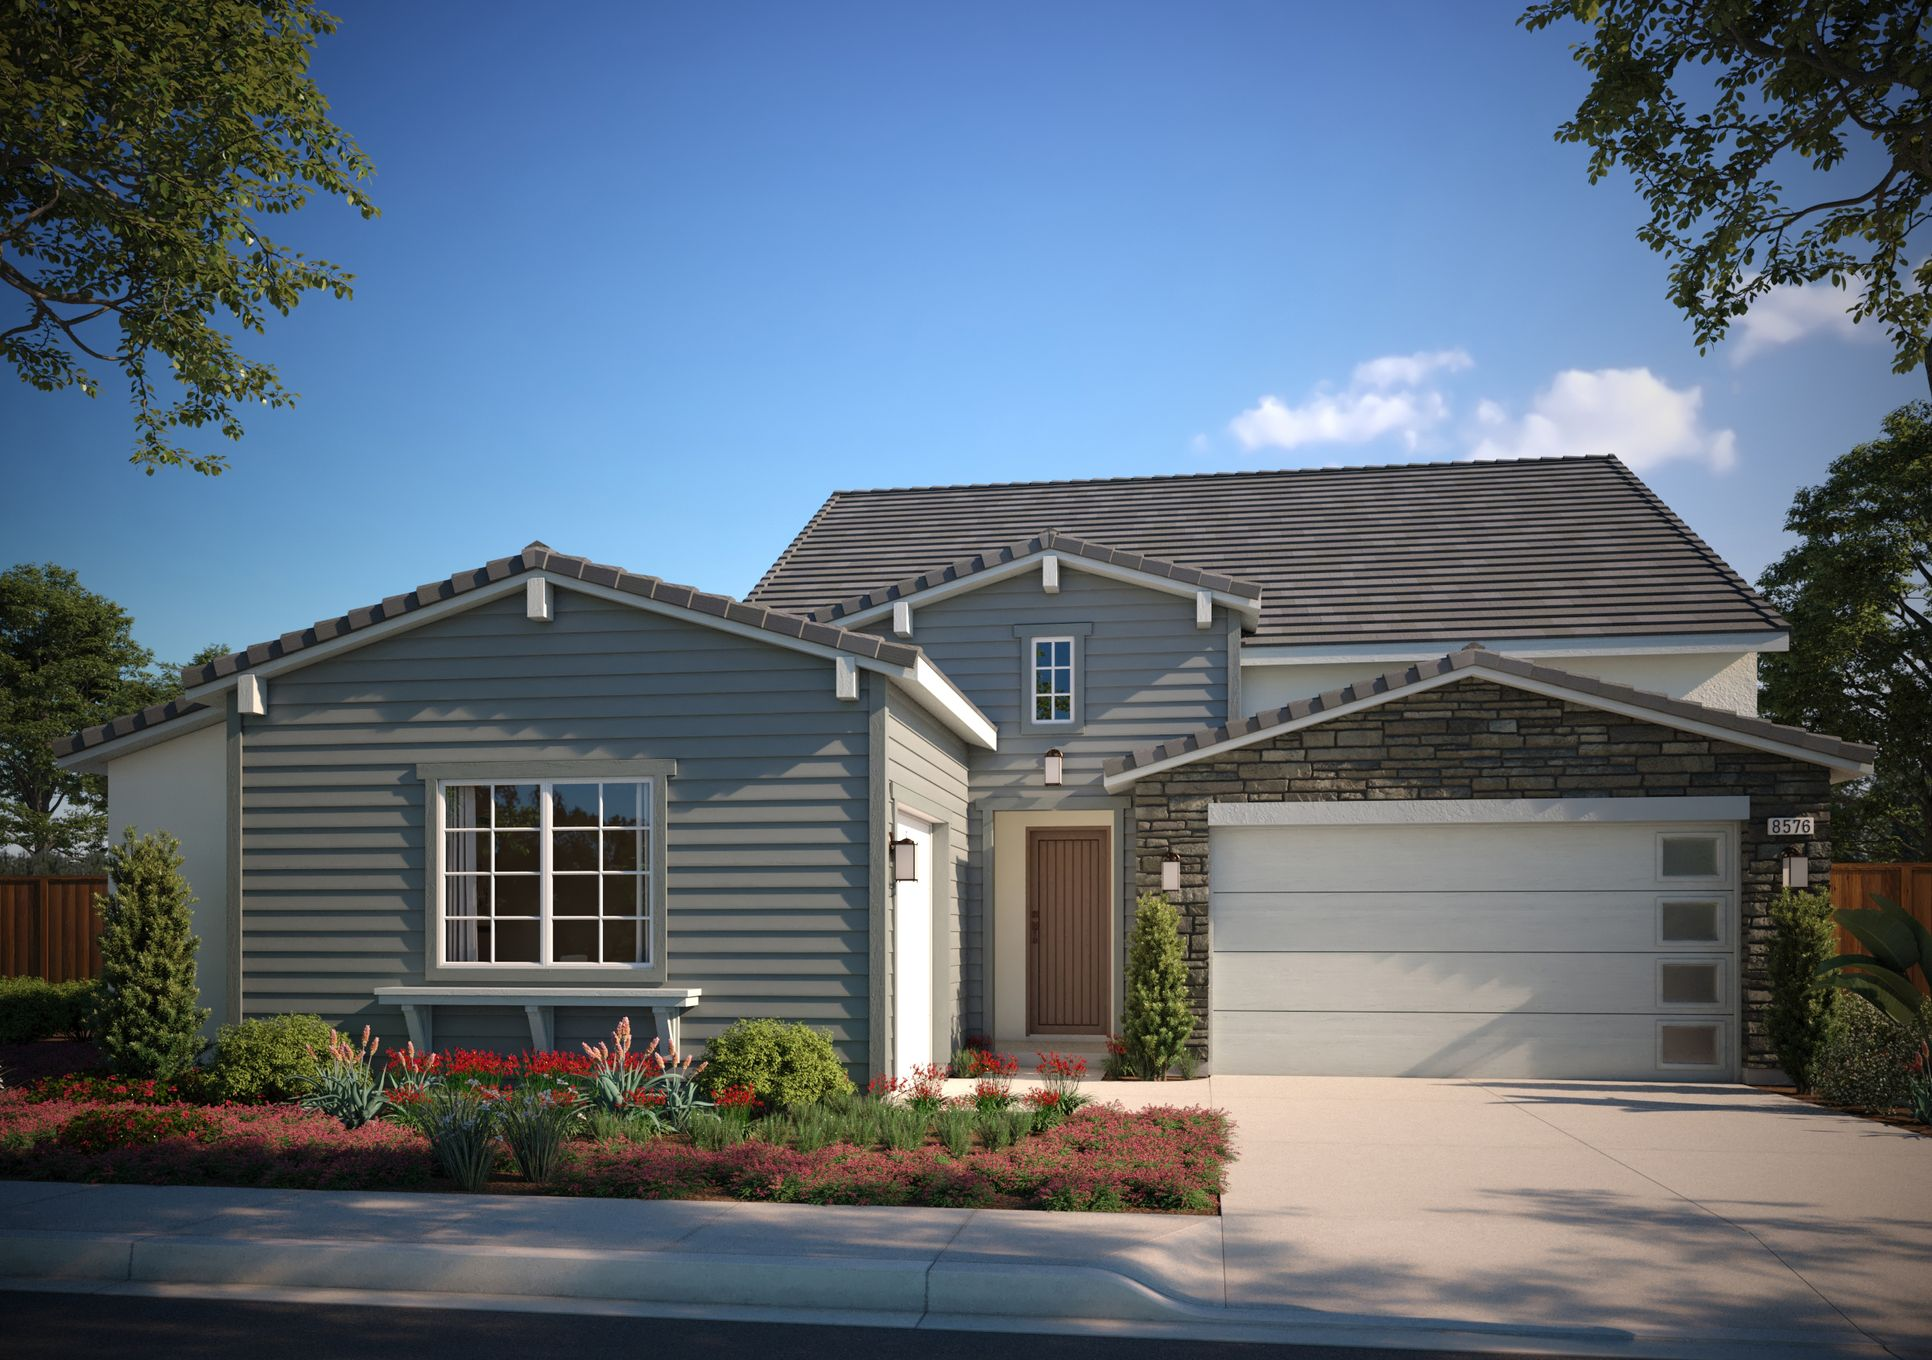 Residence 1C Modern Ranch:Residence 1C Modern Ranch